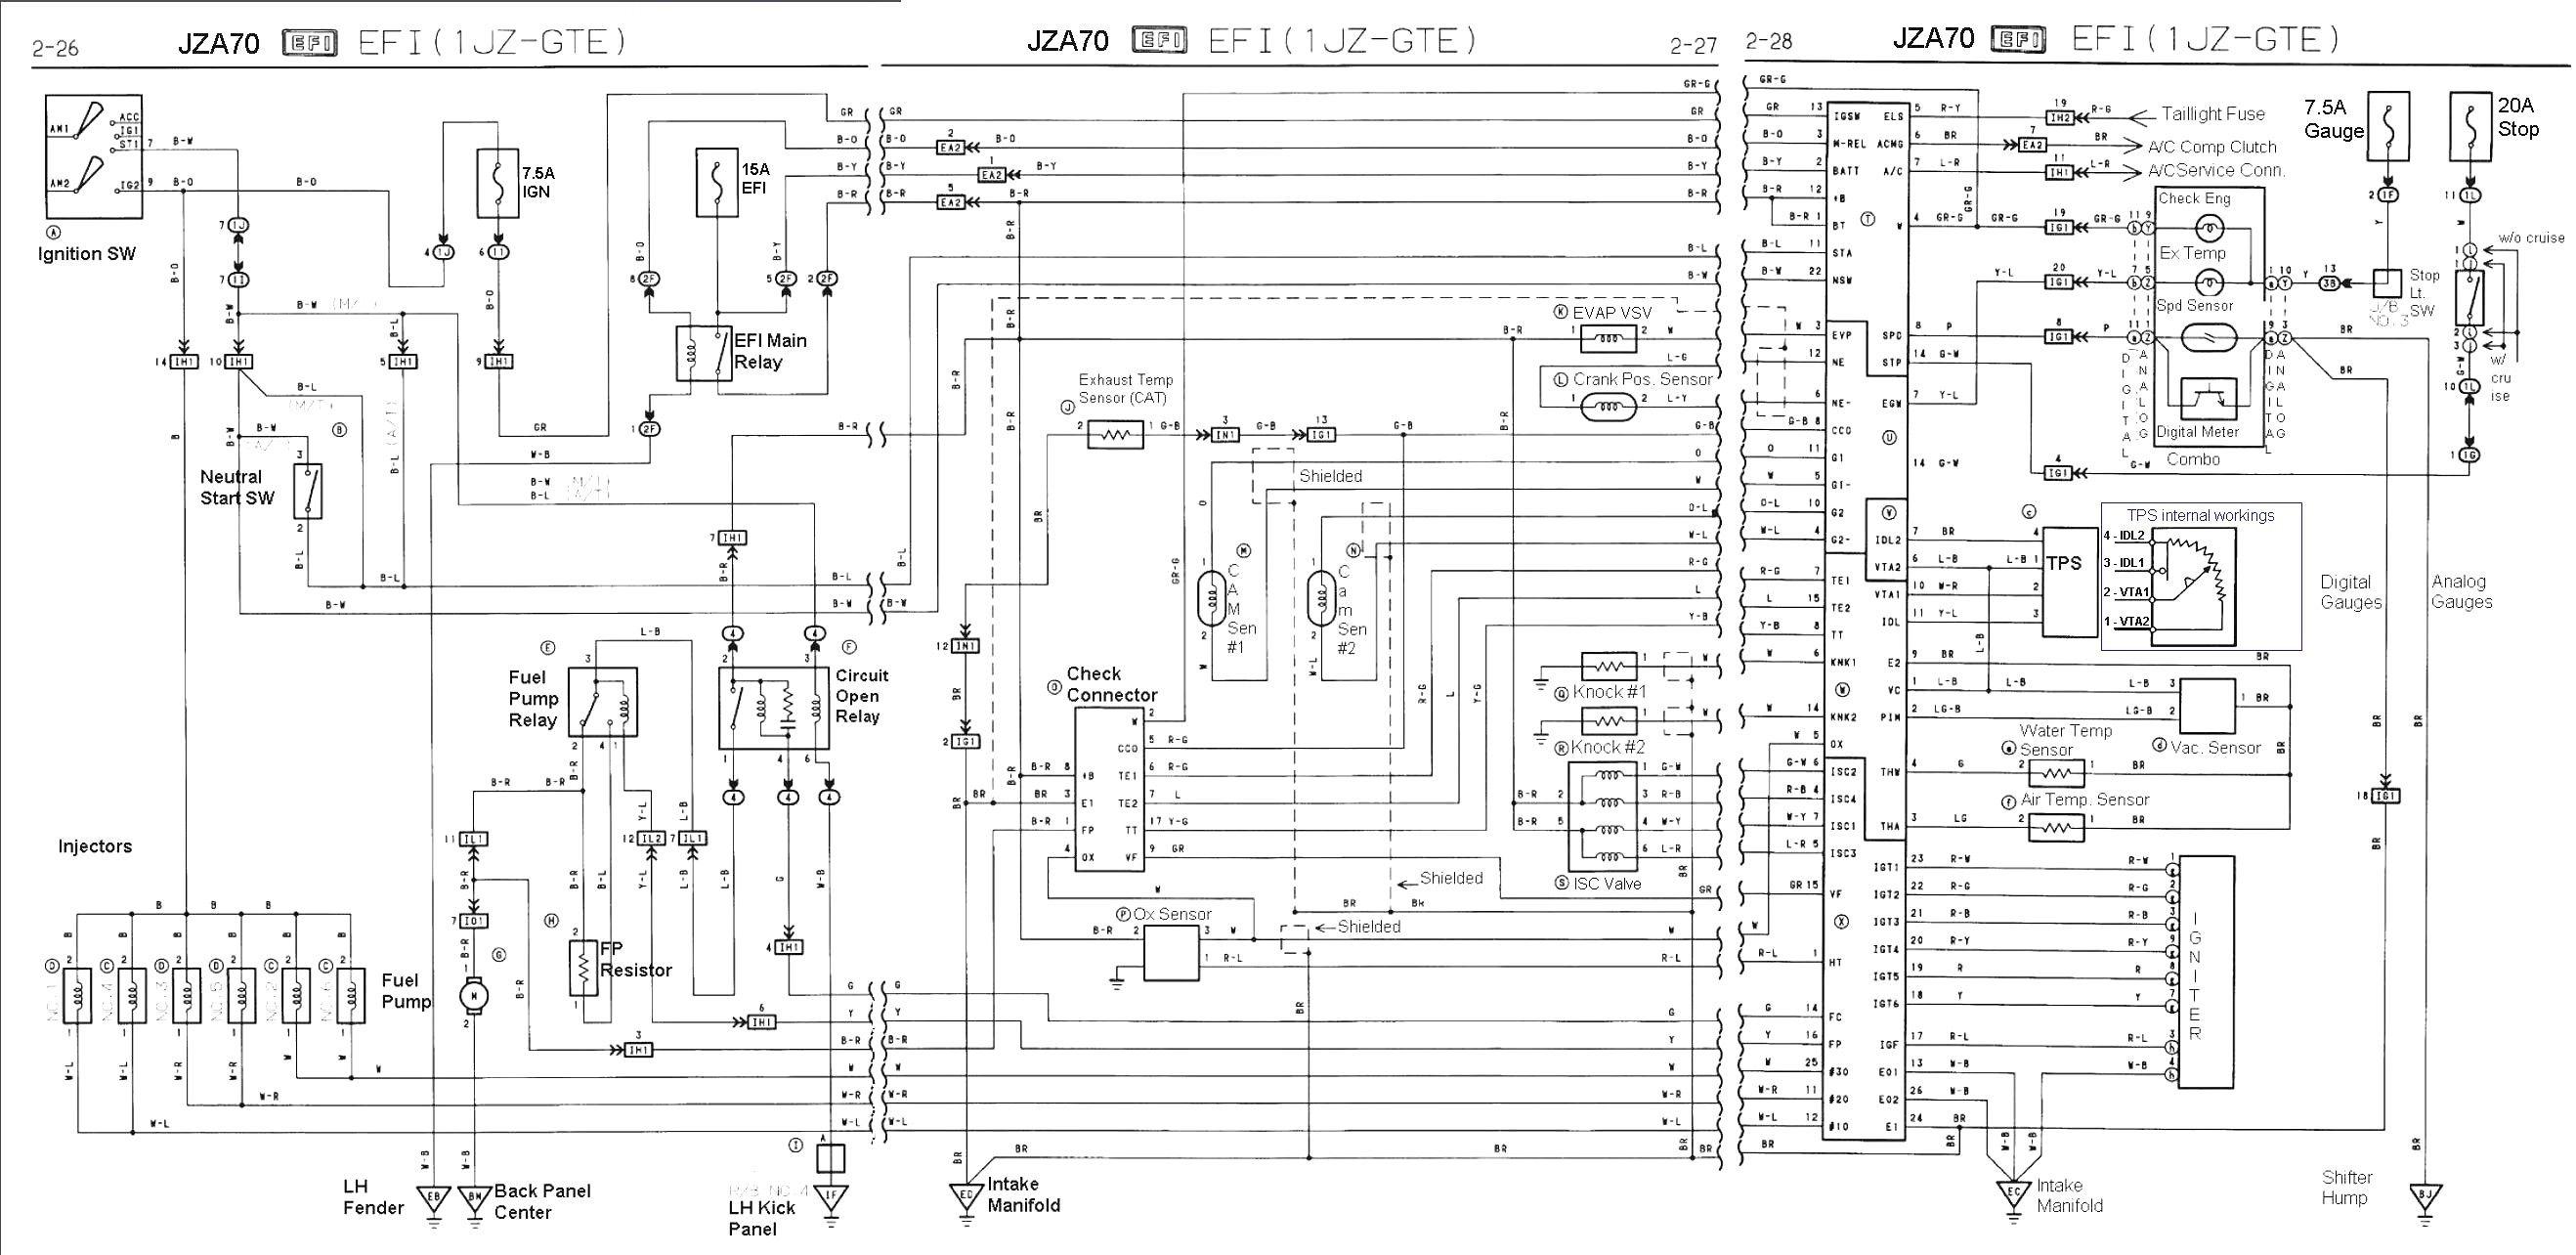 honeywell th4110d1007 wiring diagram